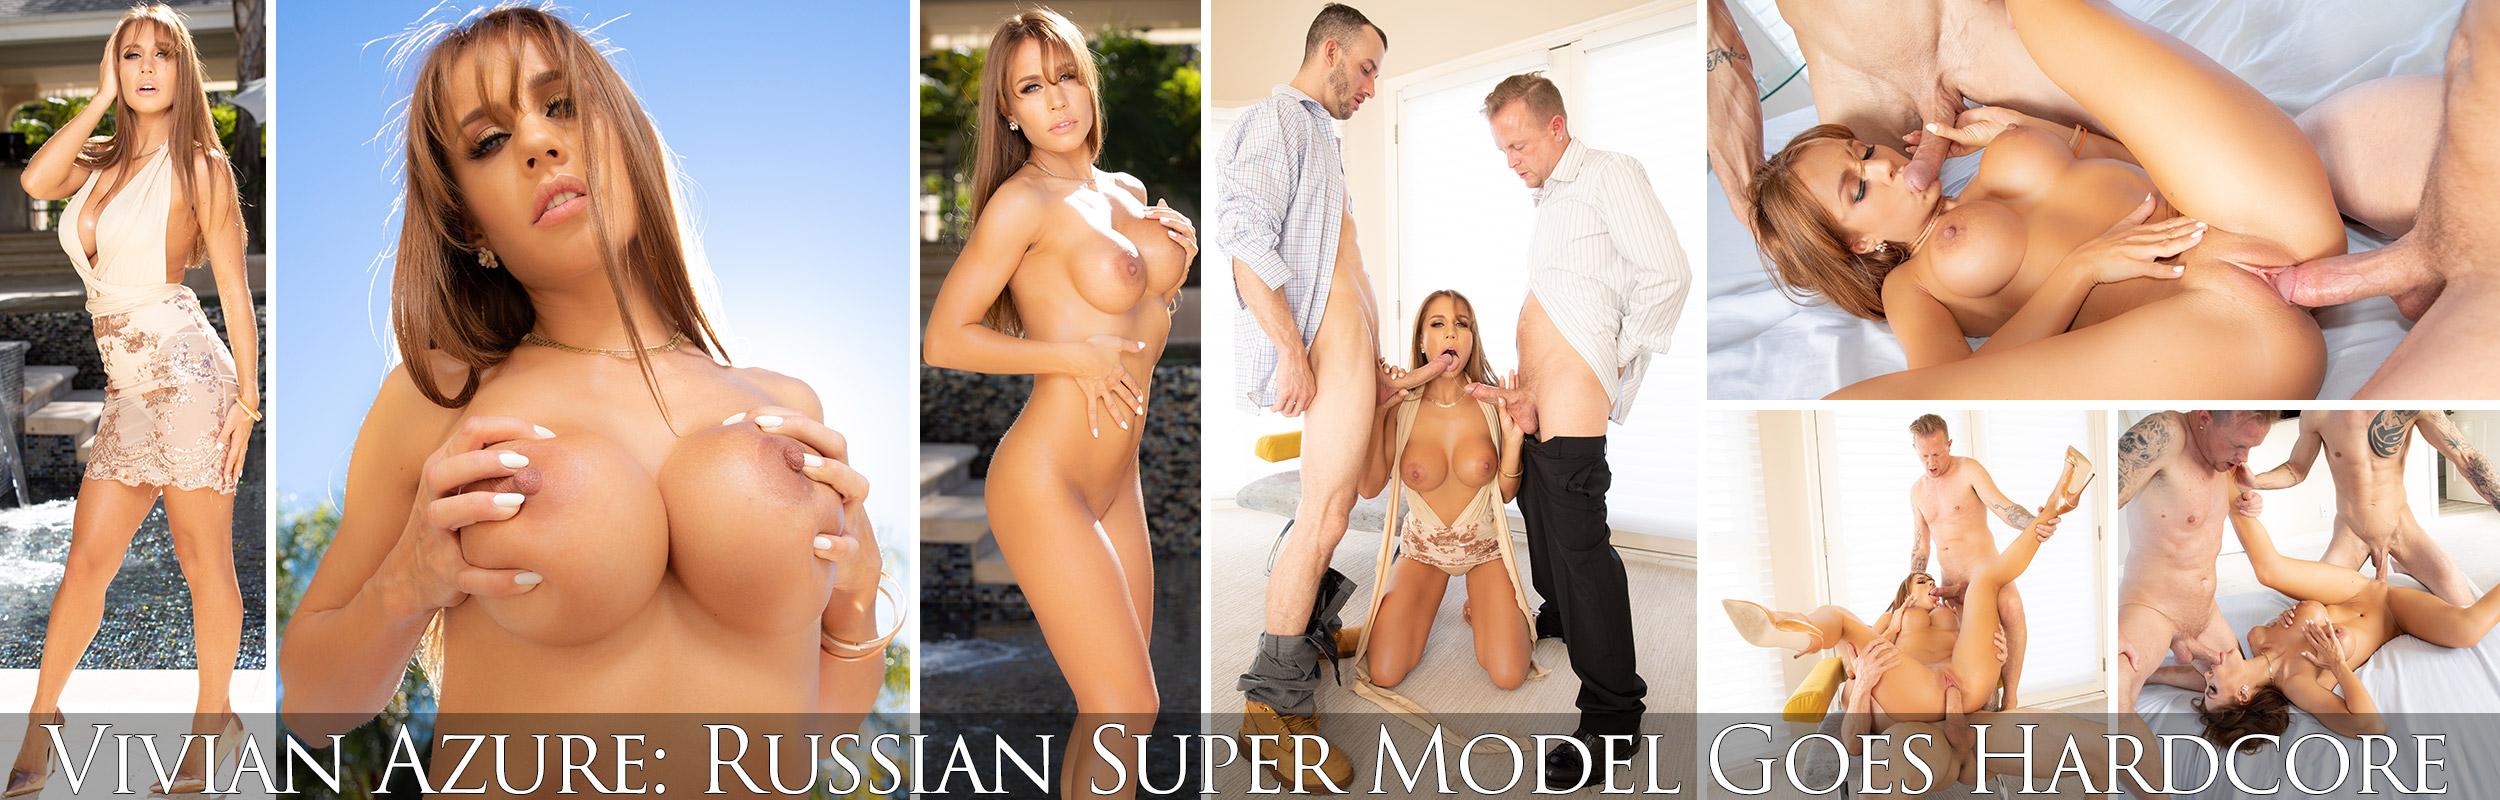 Vivian Azure: Russian Super Model Goes Hardcore